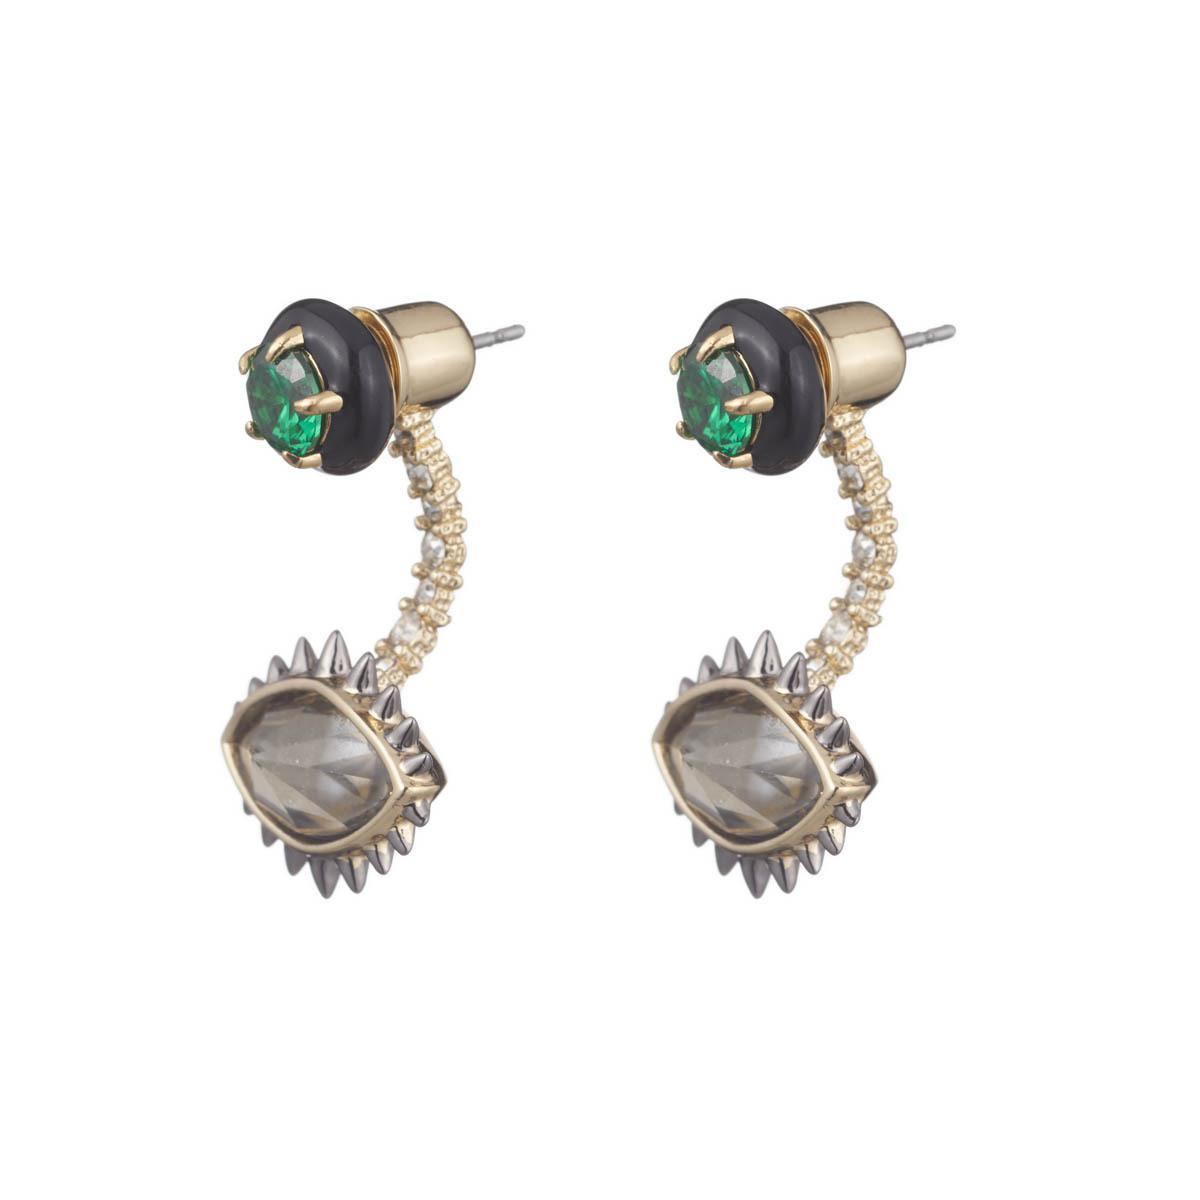 Lyst Alexis Bittar Enamel Framed Stud Earring With